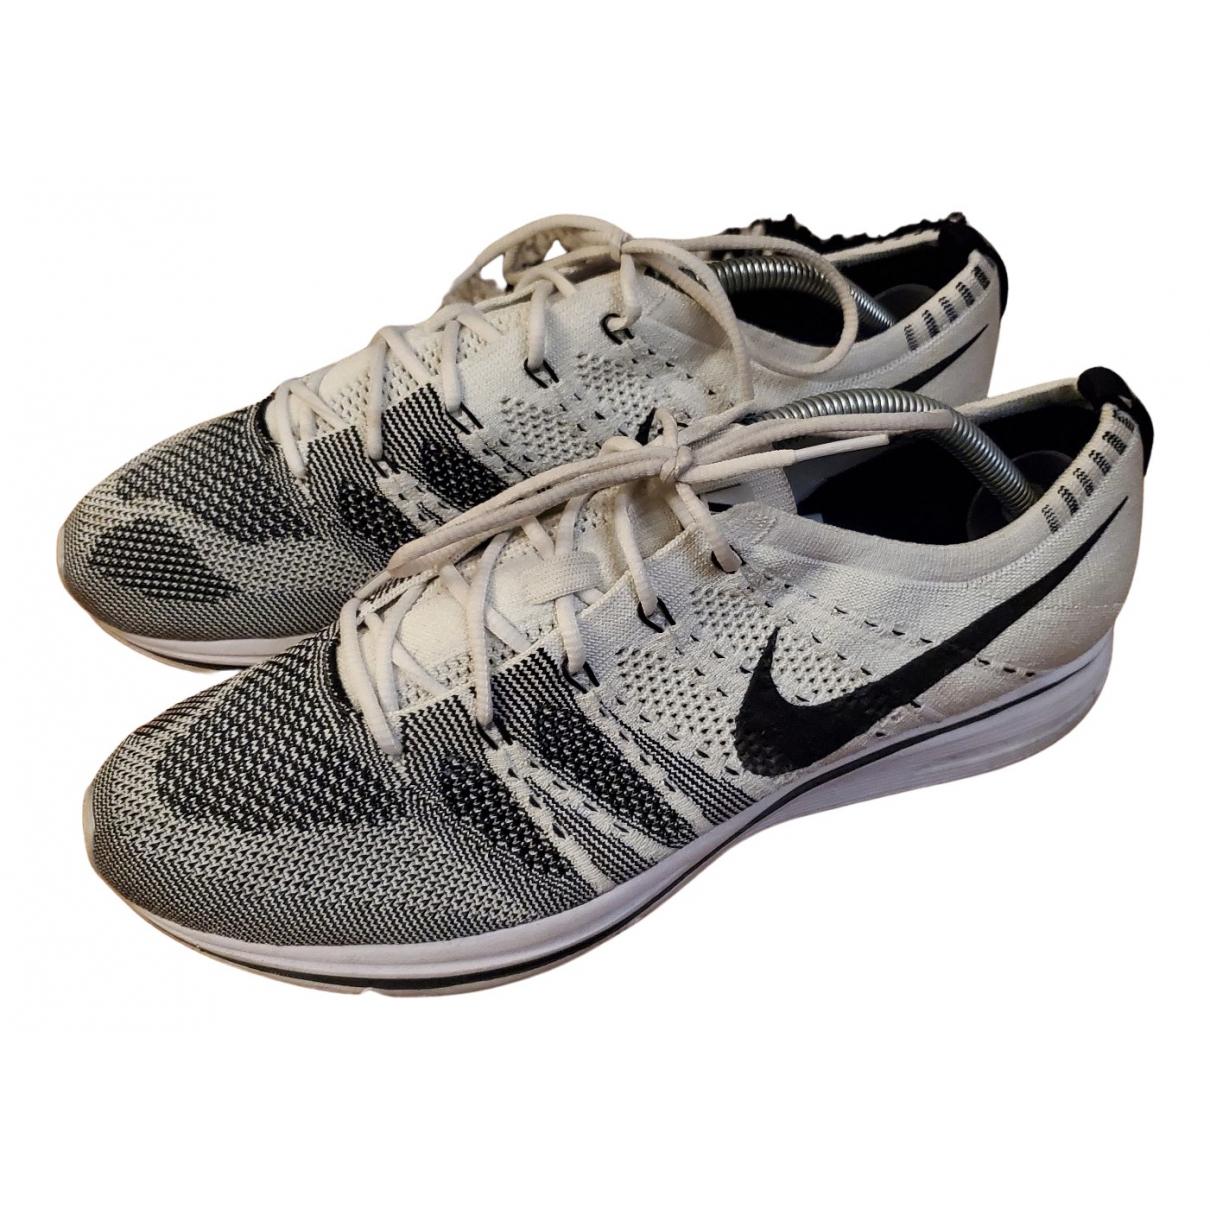 Nike \N Sneakers in  Weiss Leinen